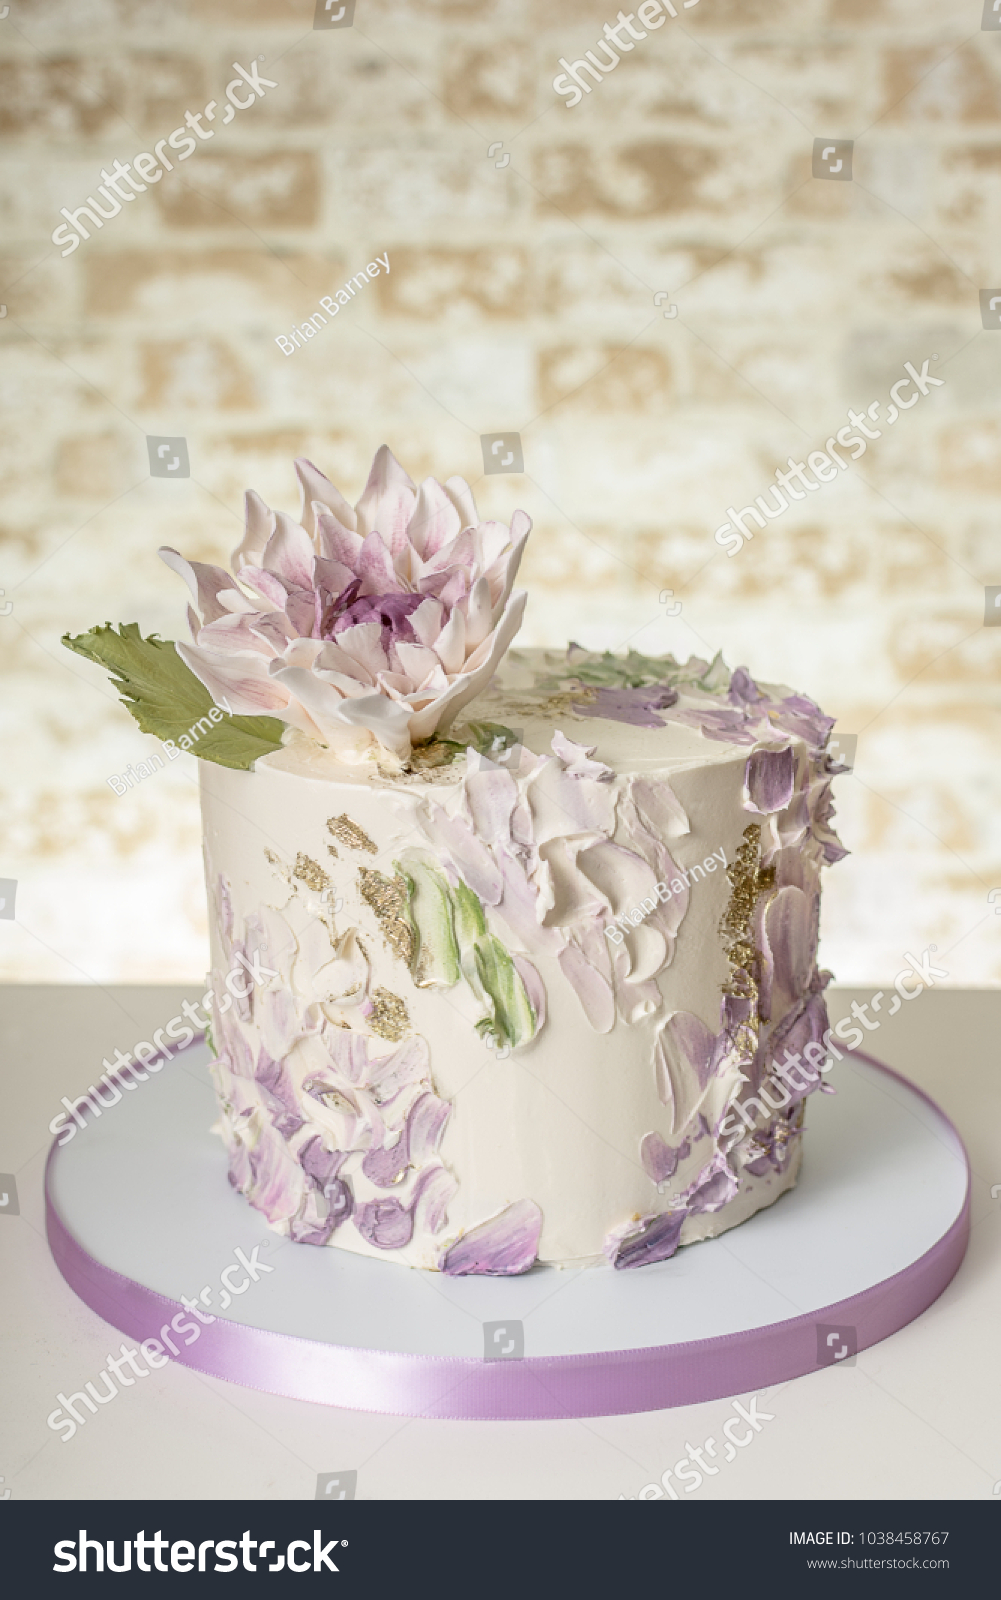 Artistic Wedding Cake Edible Dahlia Flower Stock Photo (Royalty Free ...